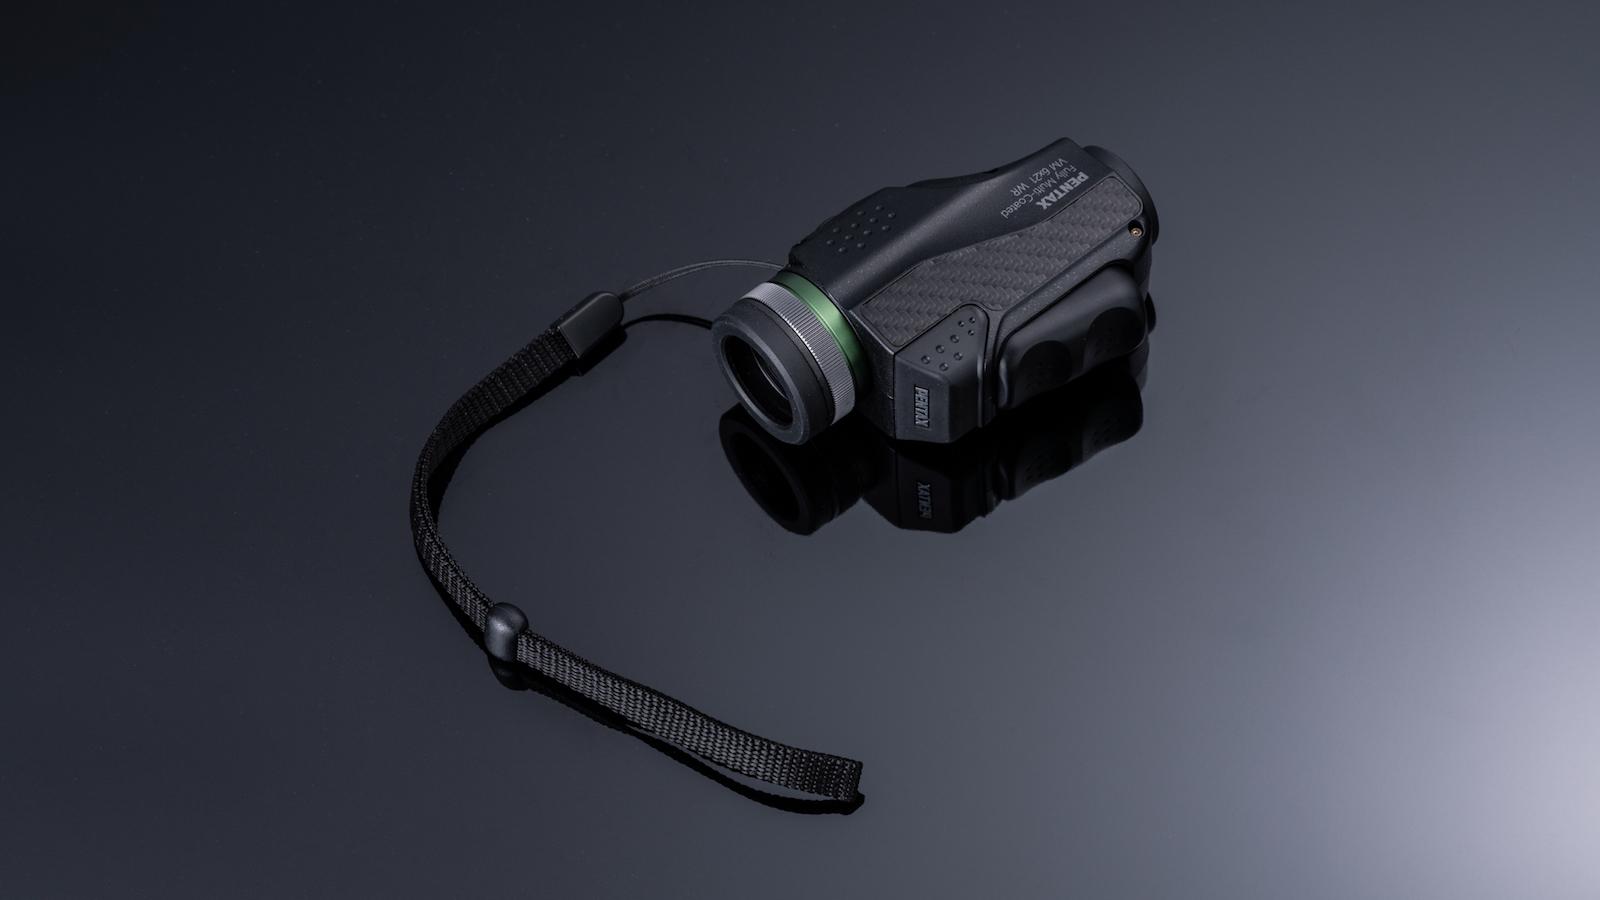 Ricoh VM 6×21 WP high-performance monocular has an ergonomic design